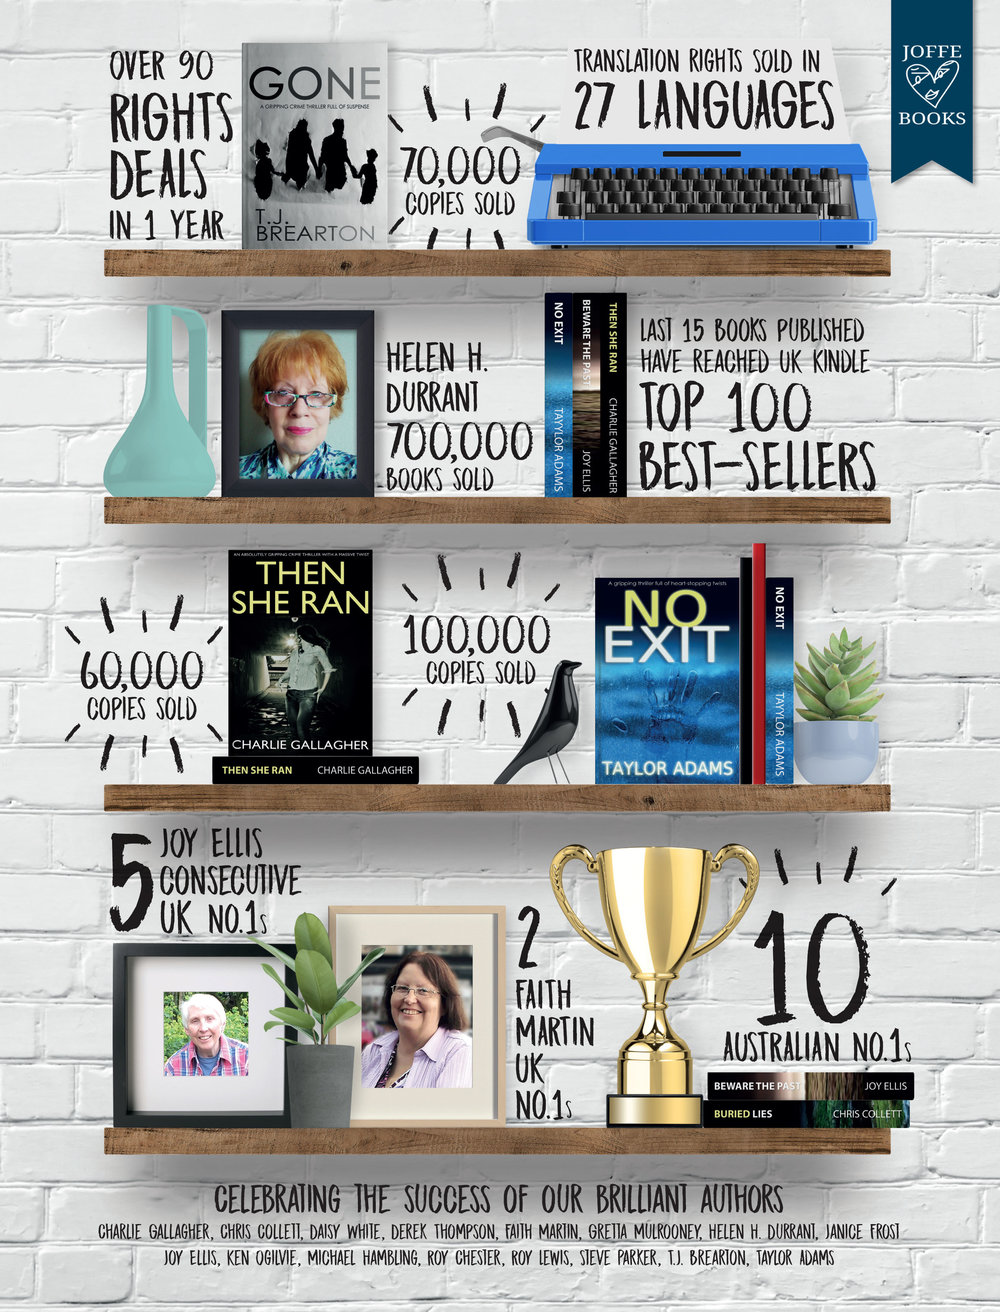 Joffe Books_Bookseller Adverts_Inside Cover_FINAL.jpg